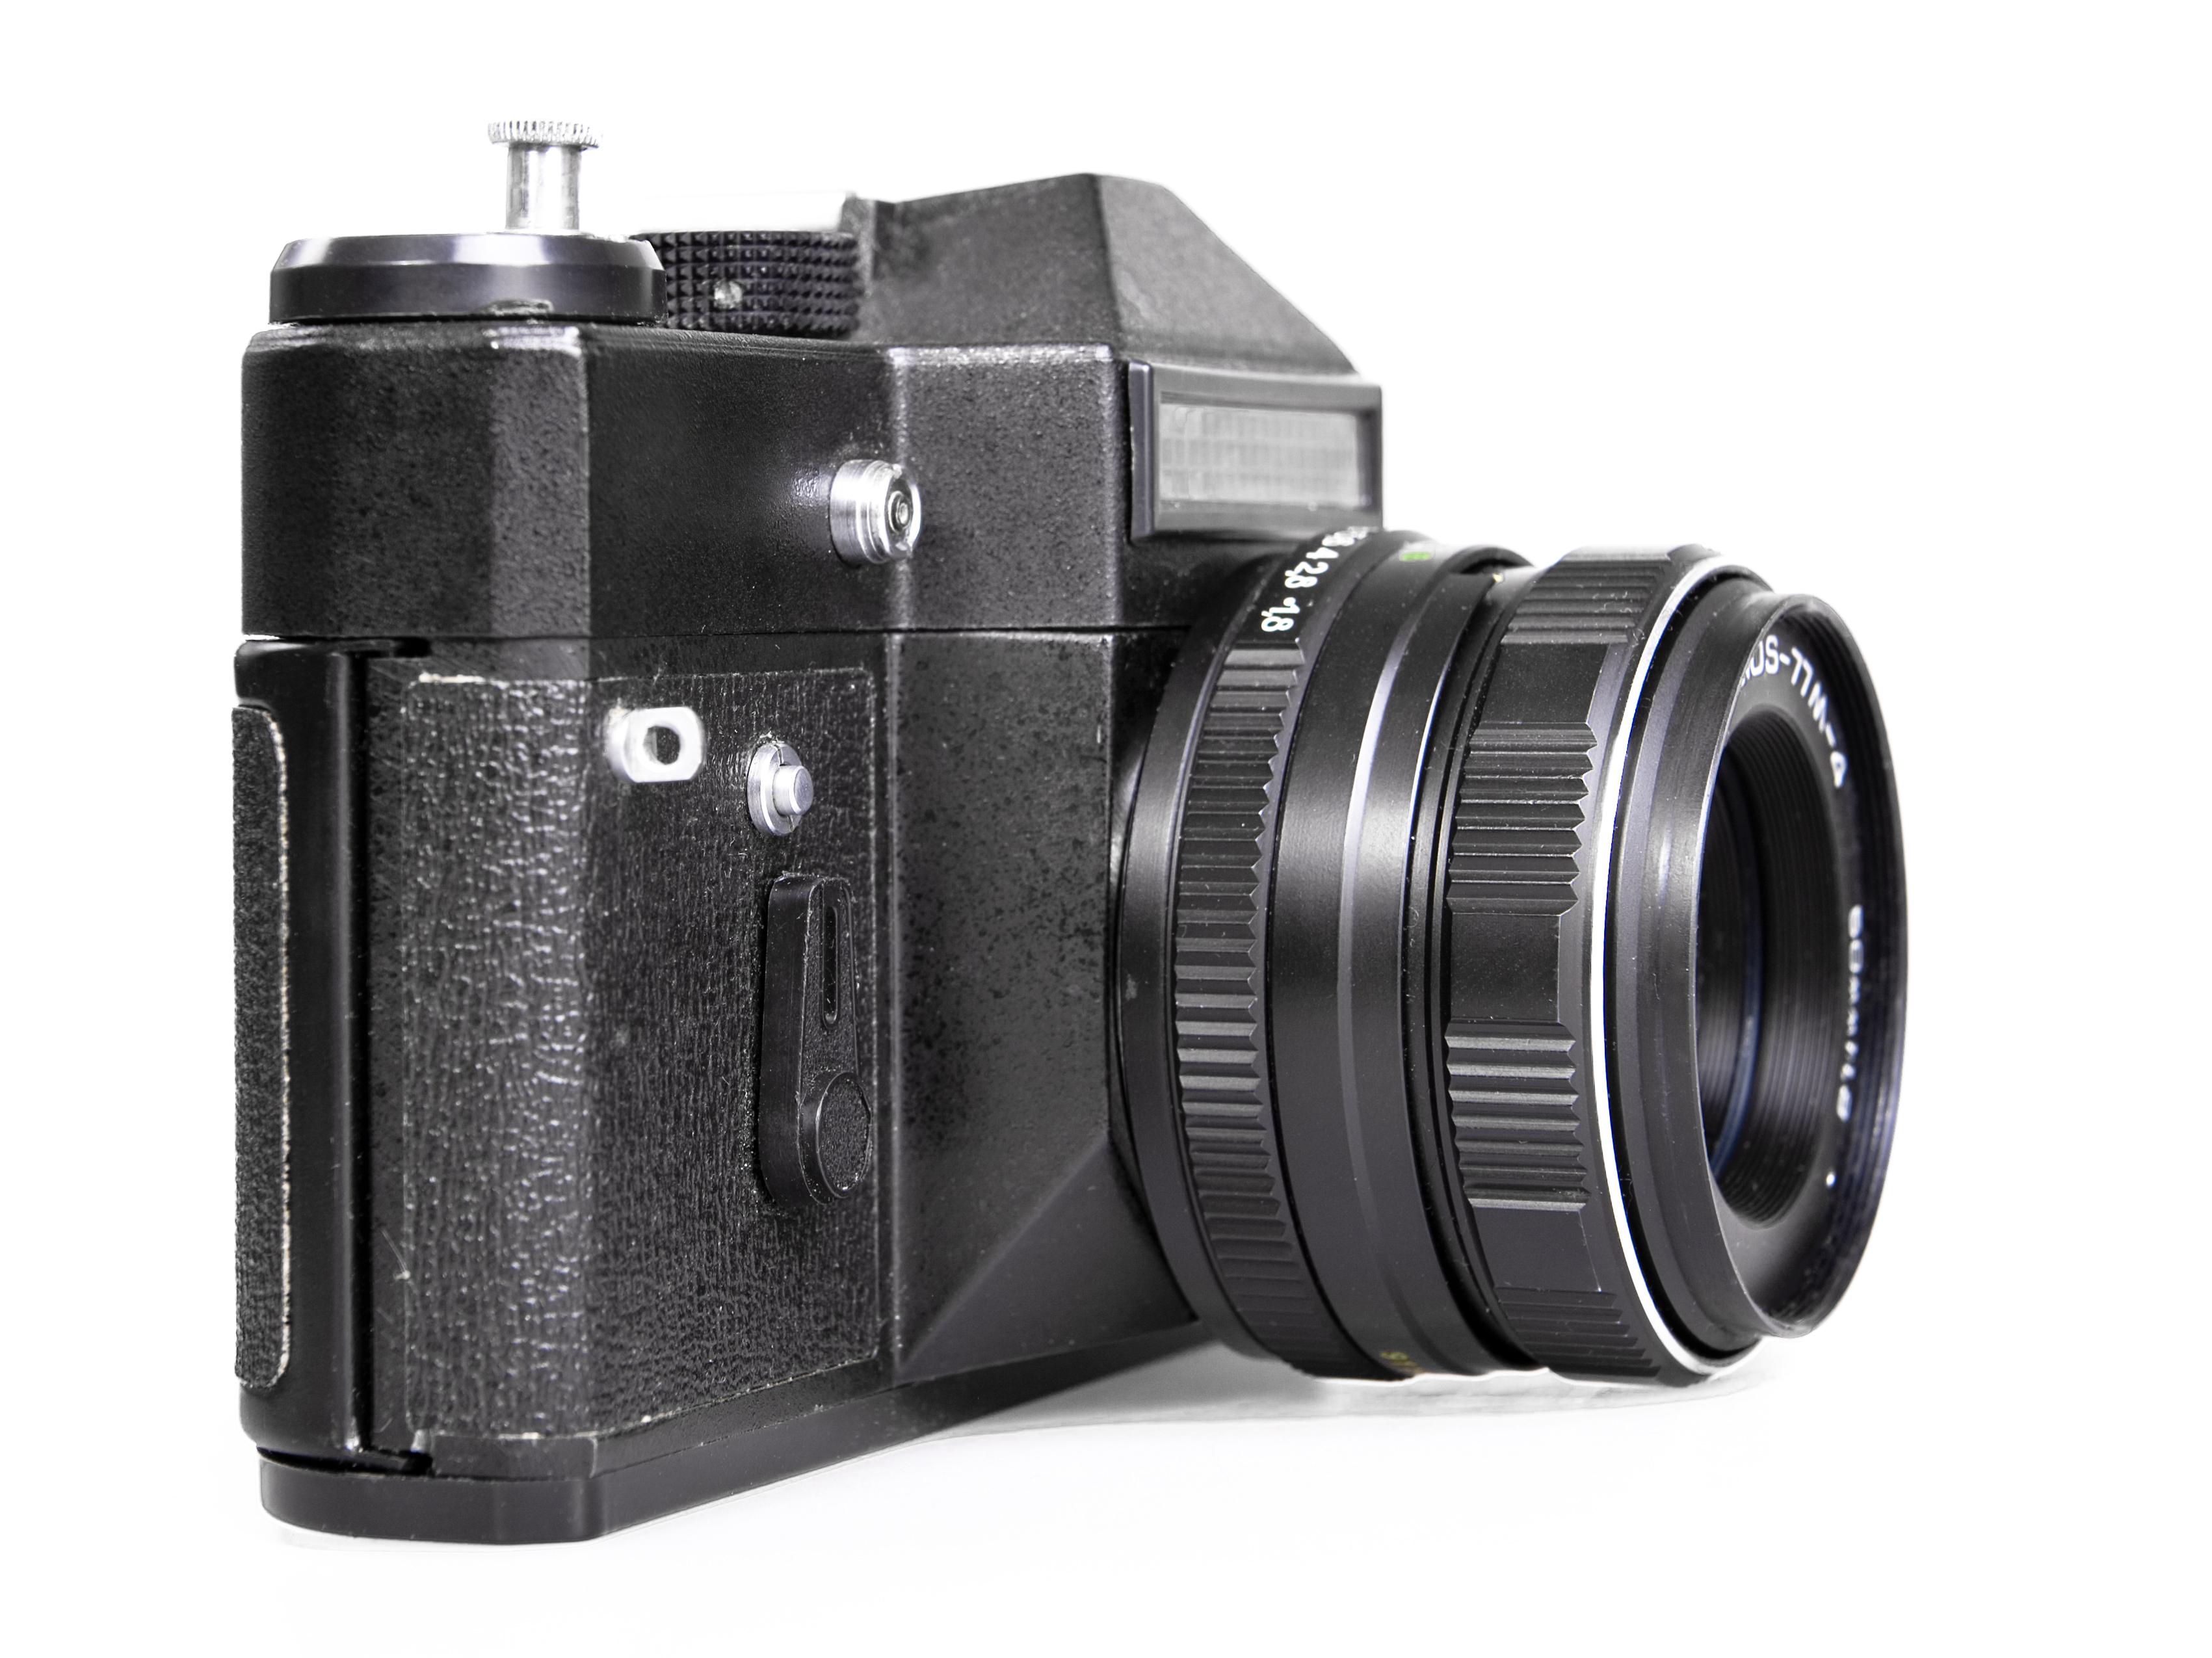 Camera, Film, Lense, Photographer, Photography, HQ Photo